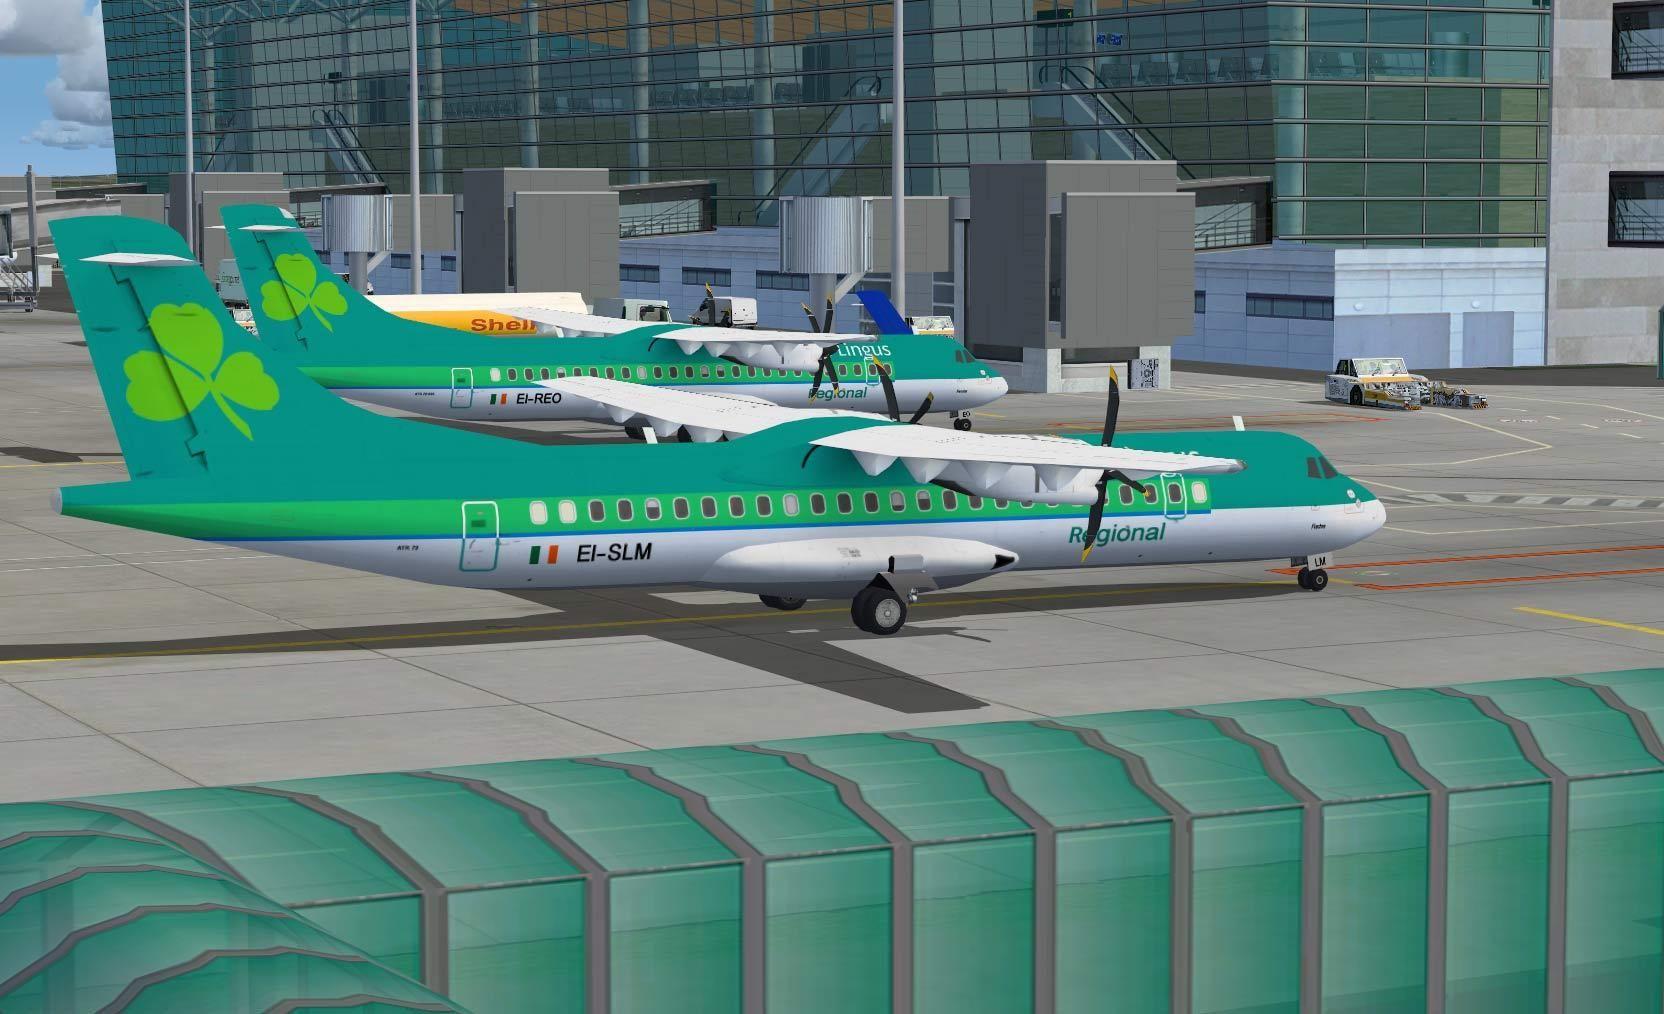 ATR72-210/500 in Ae Lingus Regional color scheme.